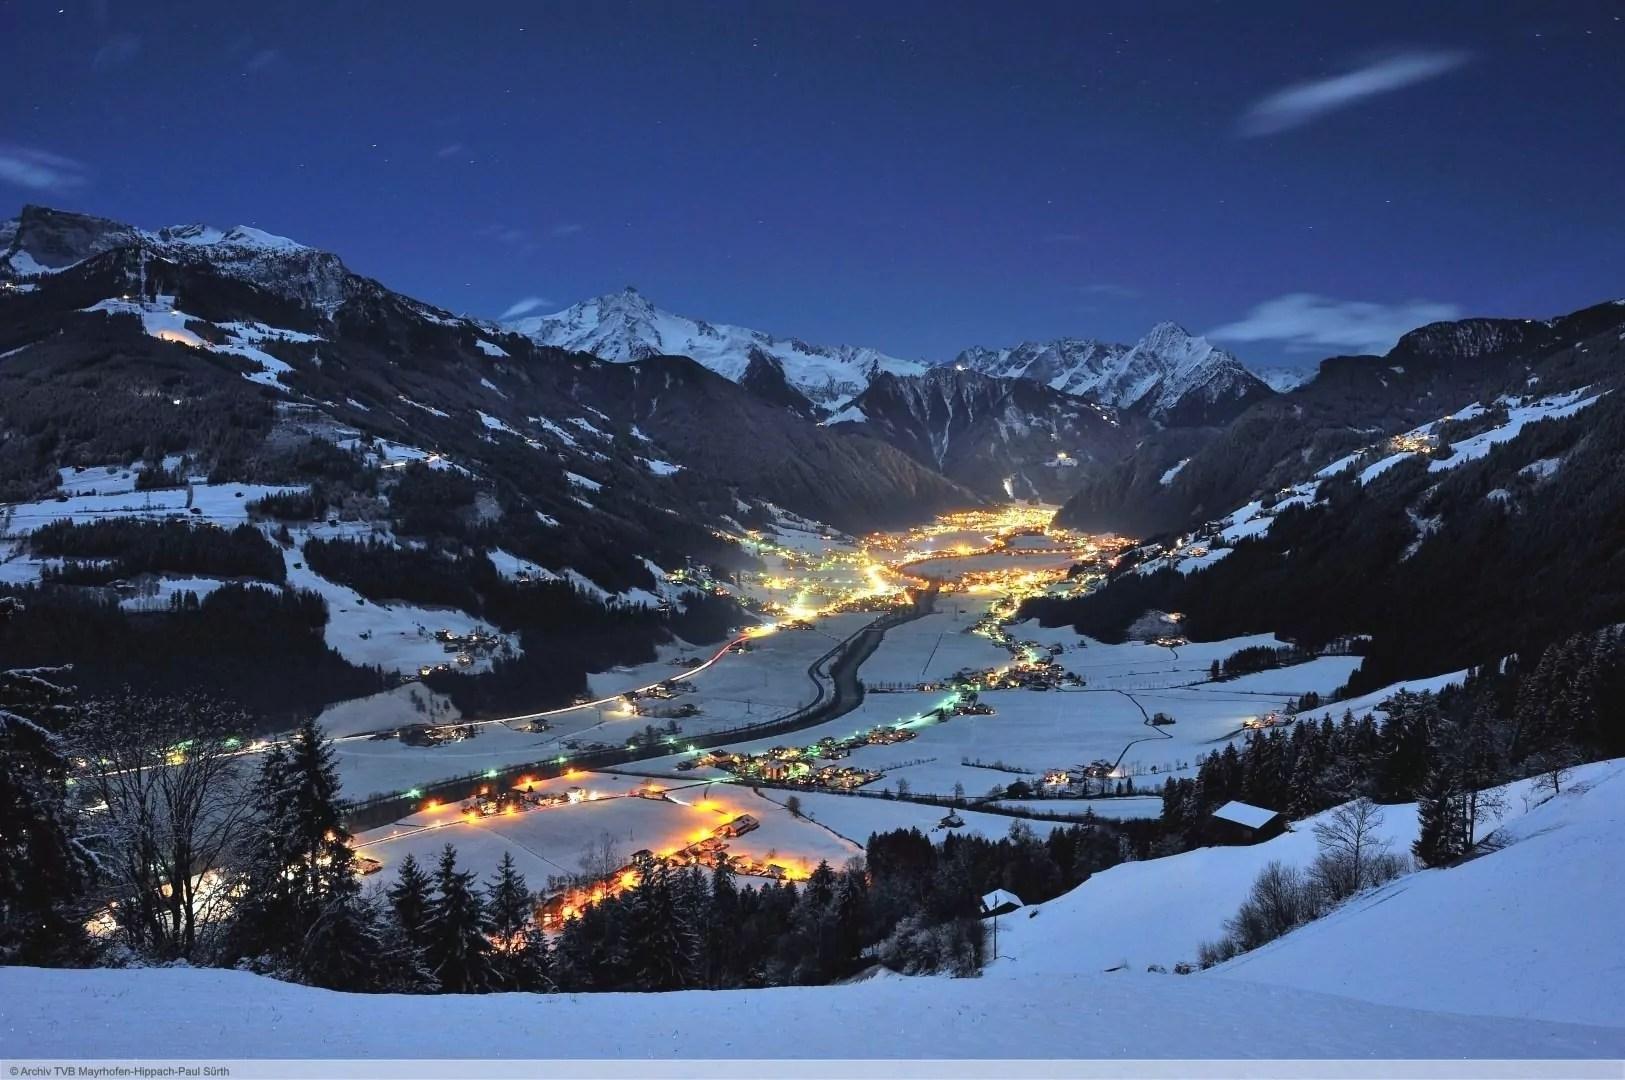 wintersport en aanbiedingen in Hippach - Schwendau - Ramsau